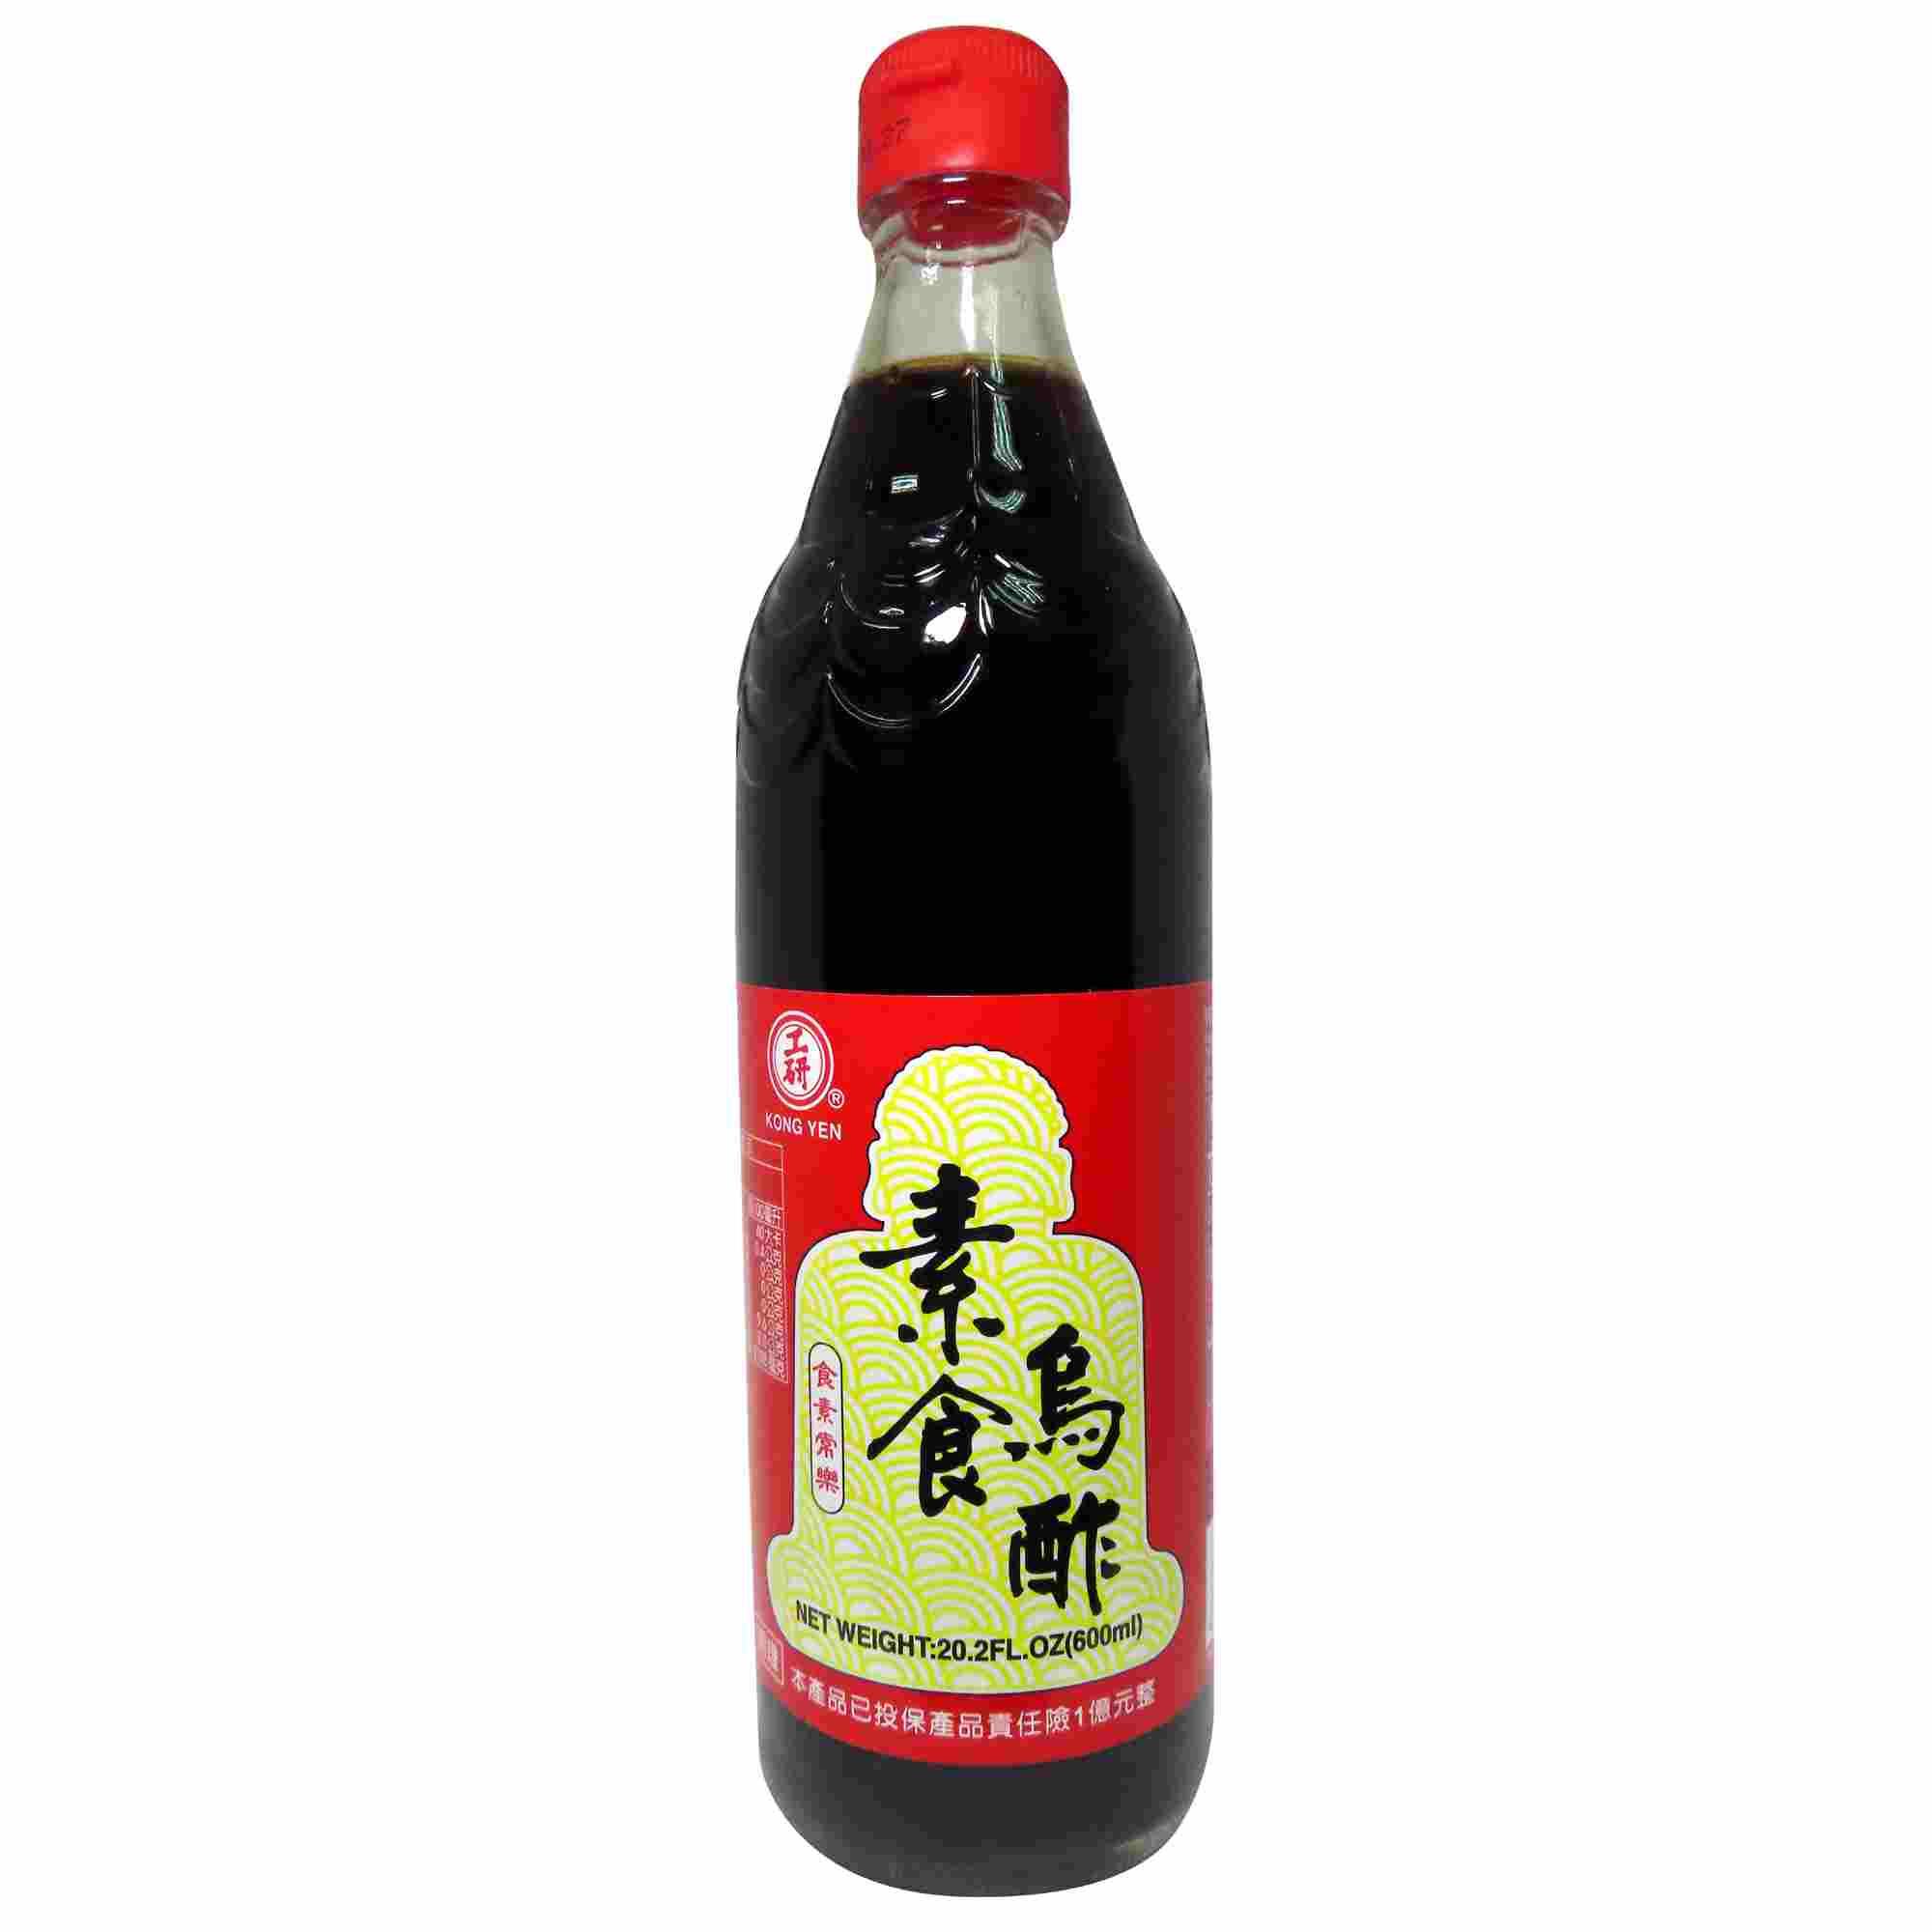 Image Black Vinegar (Taiwan) 工研 - 素食乌醋 600grams